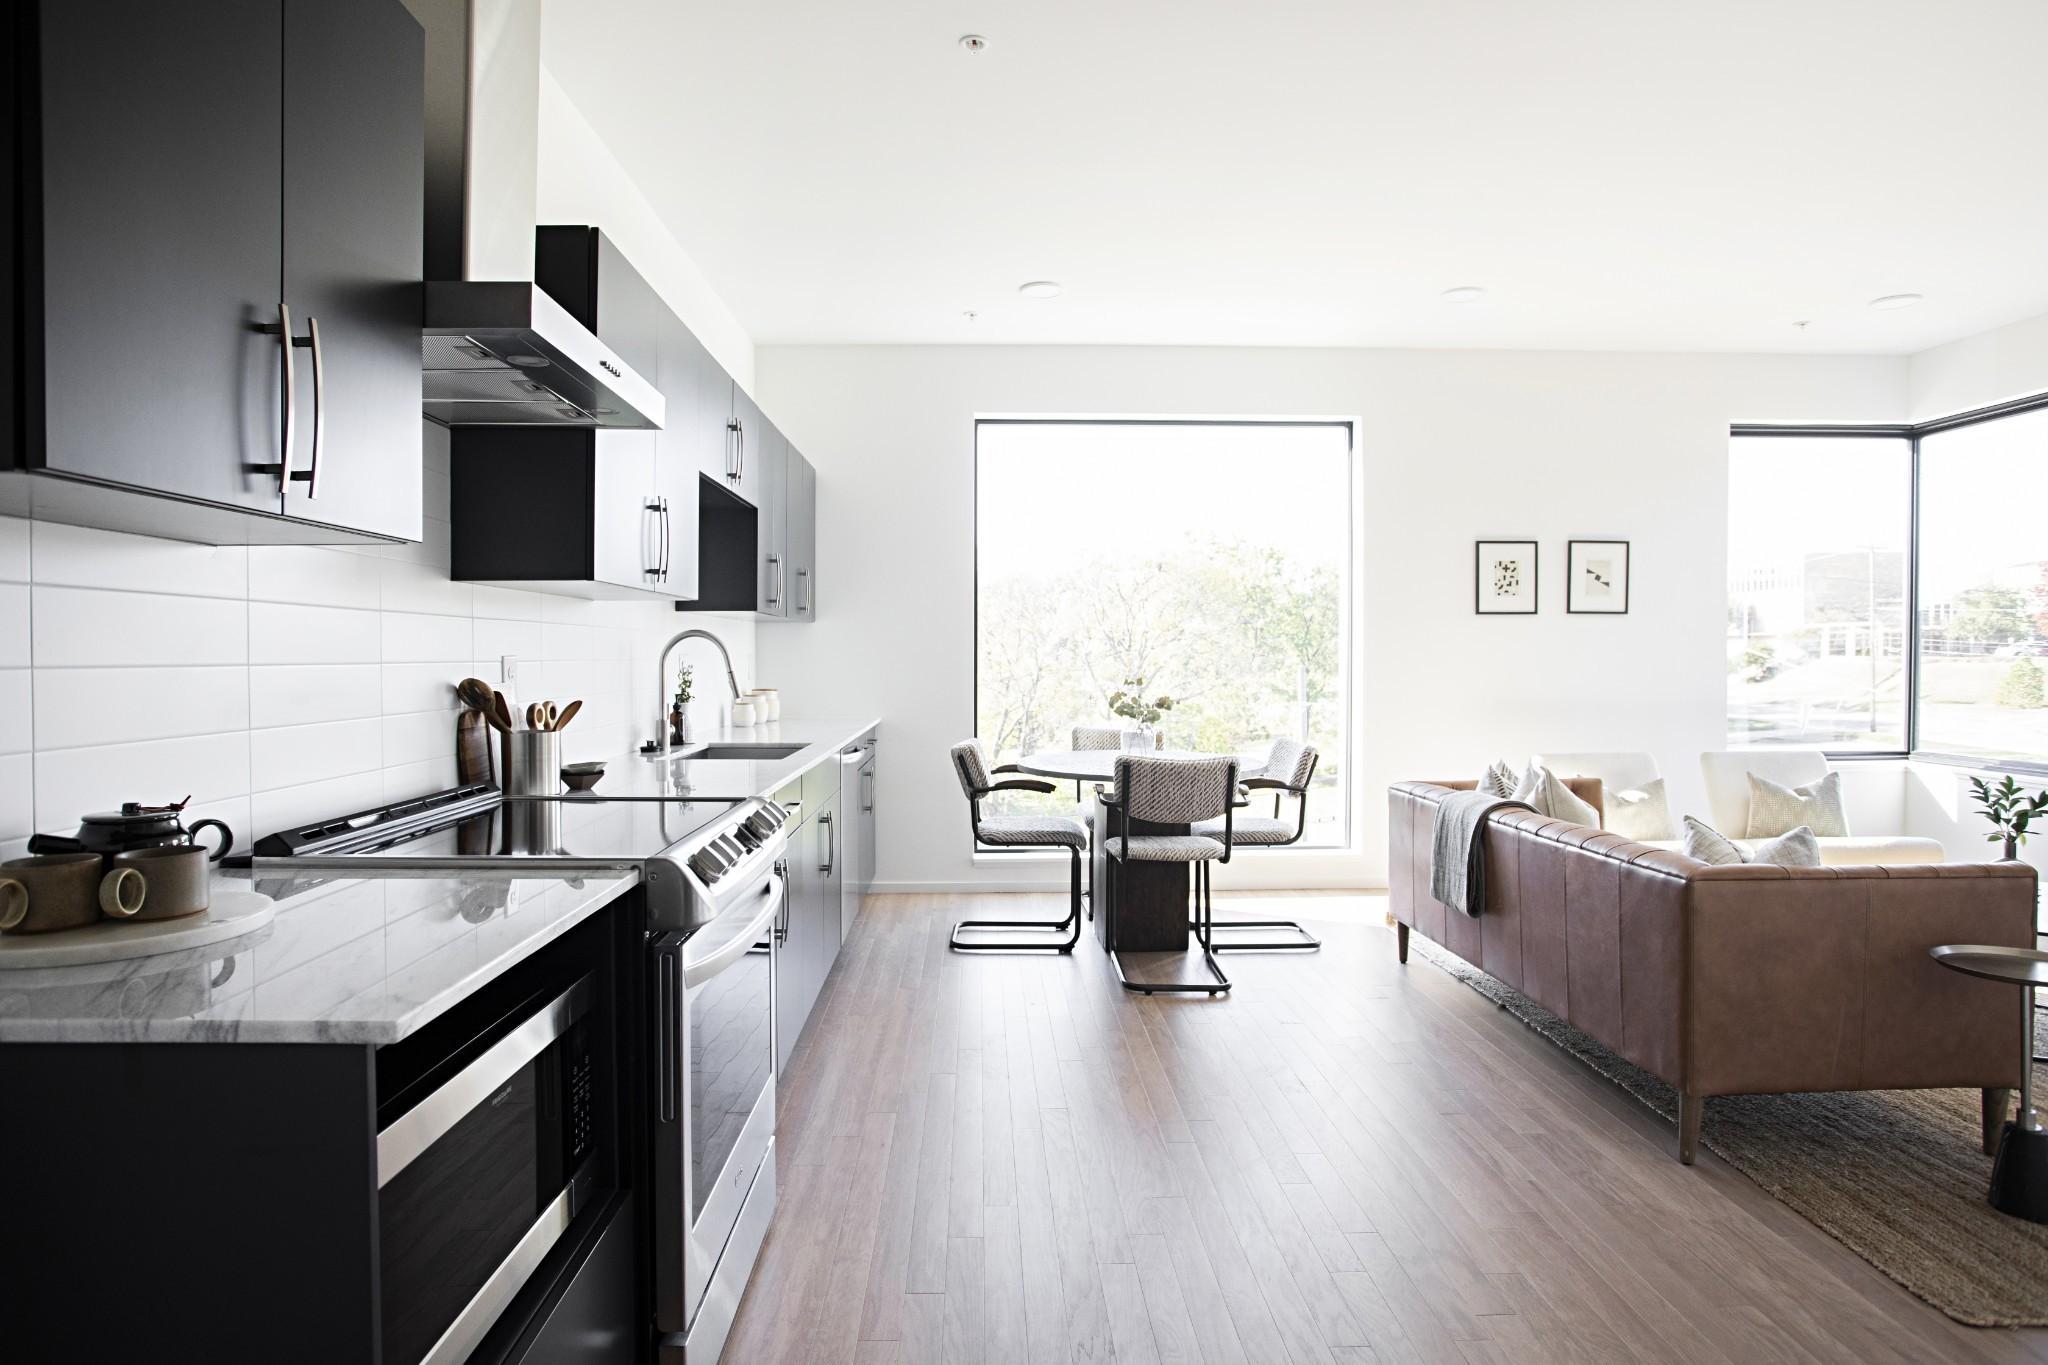 806 Olympic St #401 Property Photo - Nashville, TN real estate listing